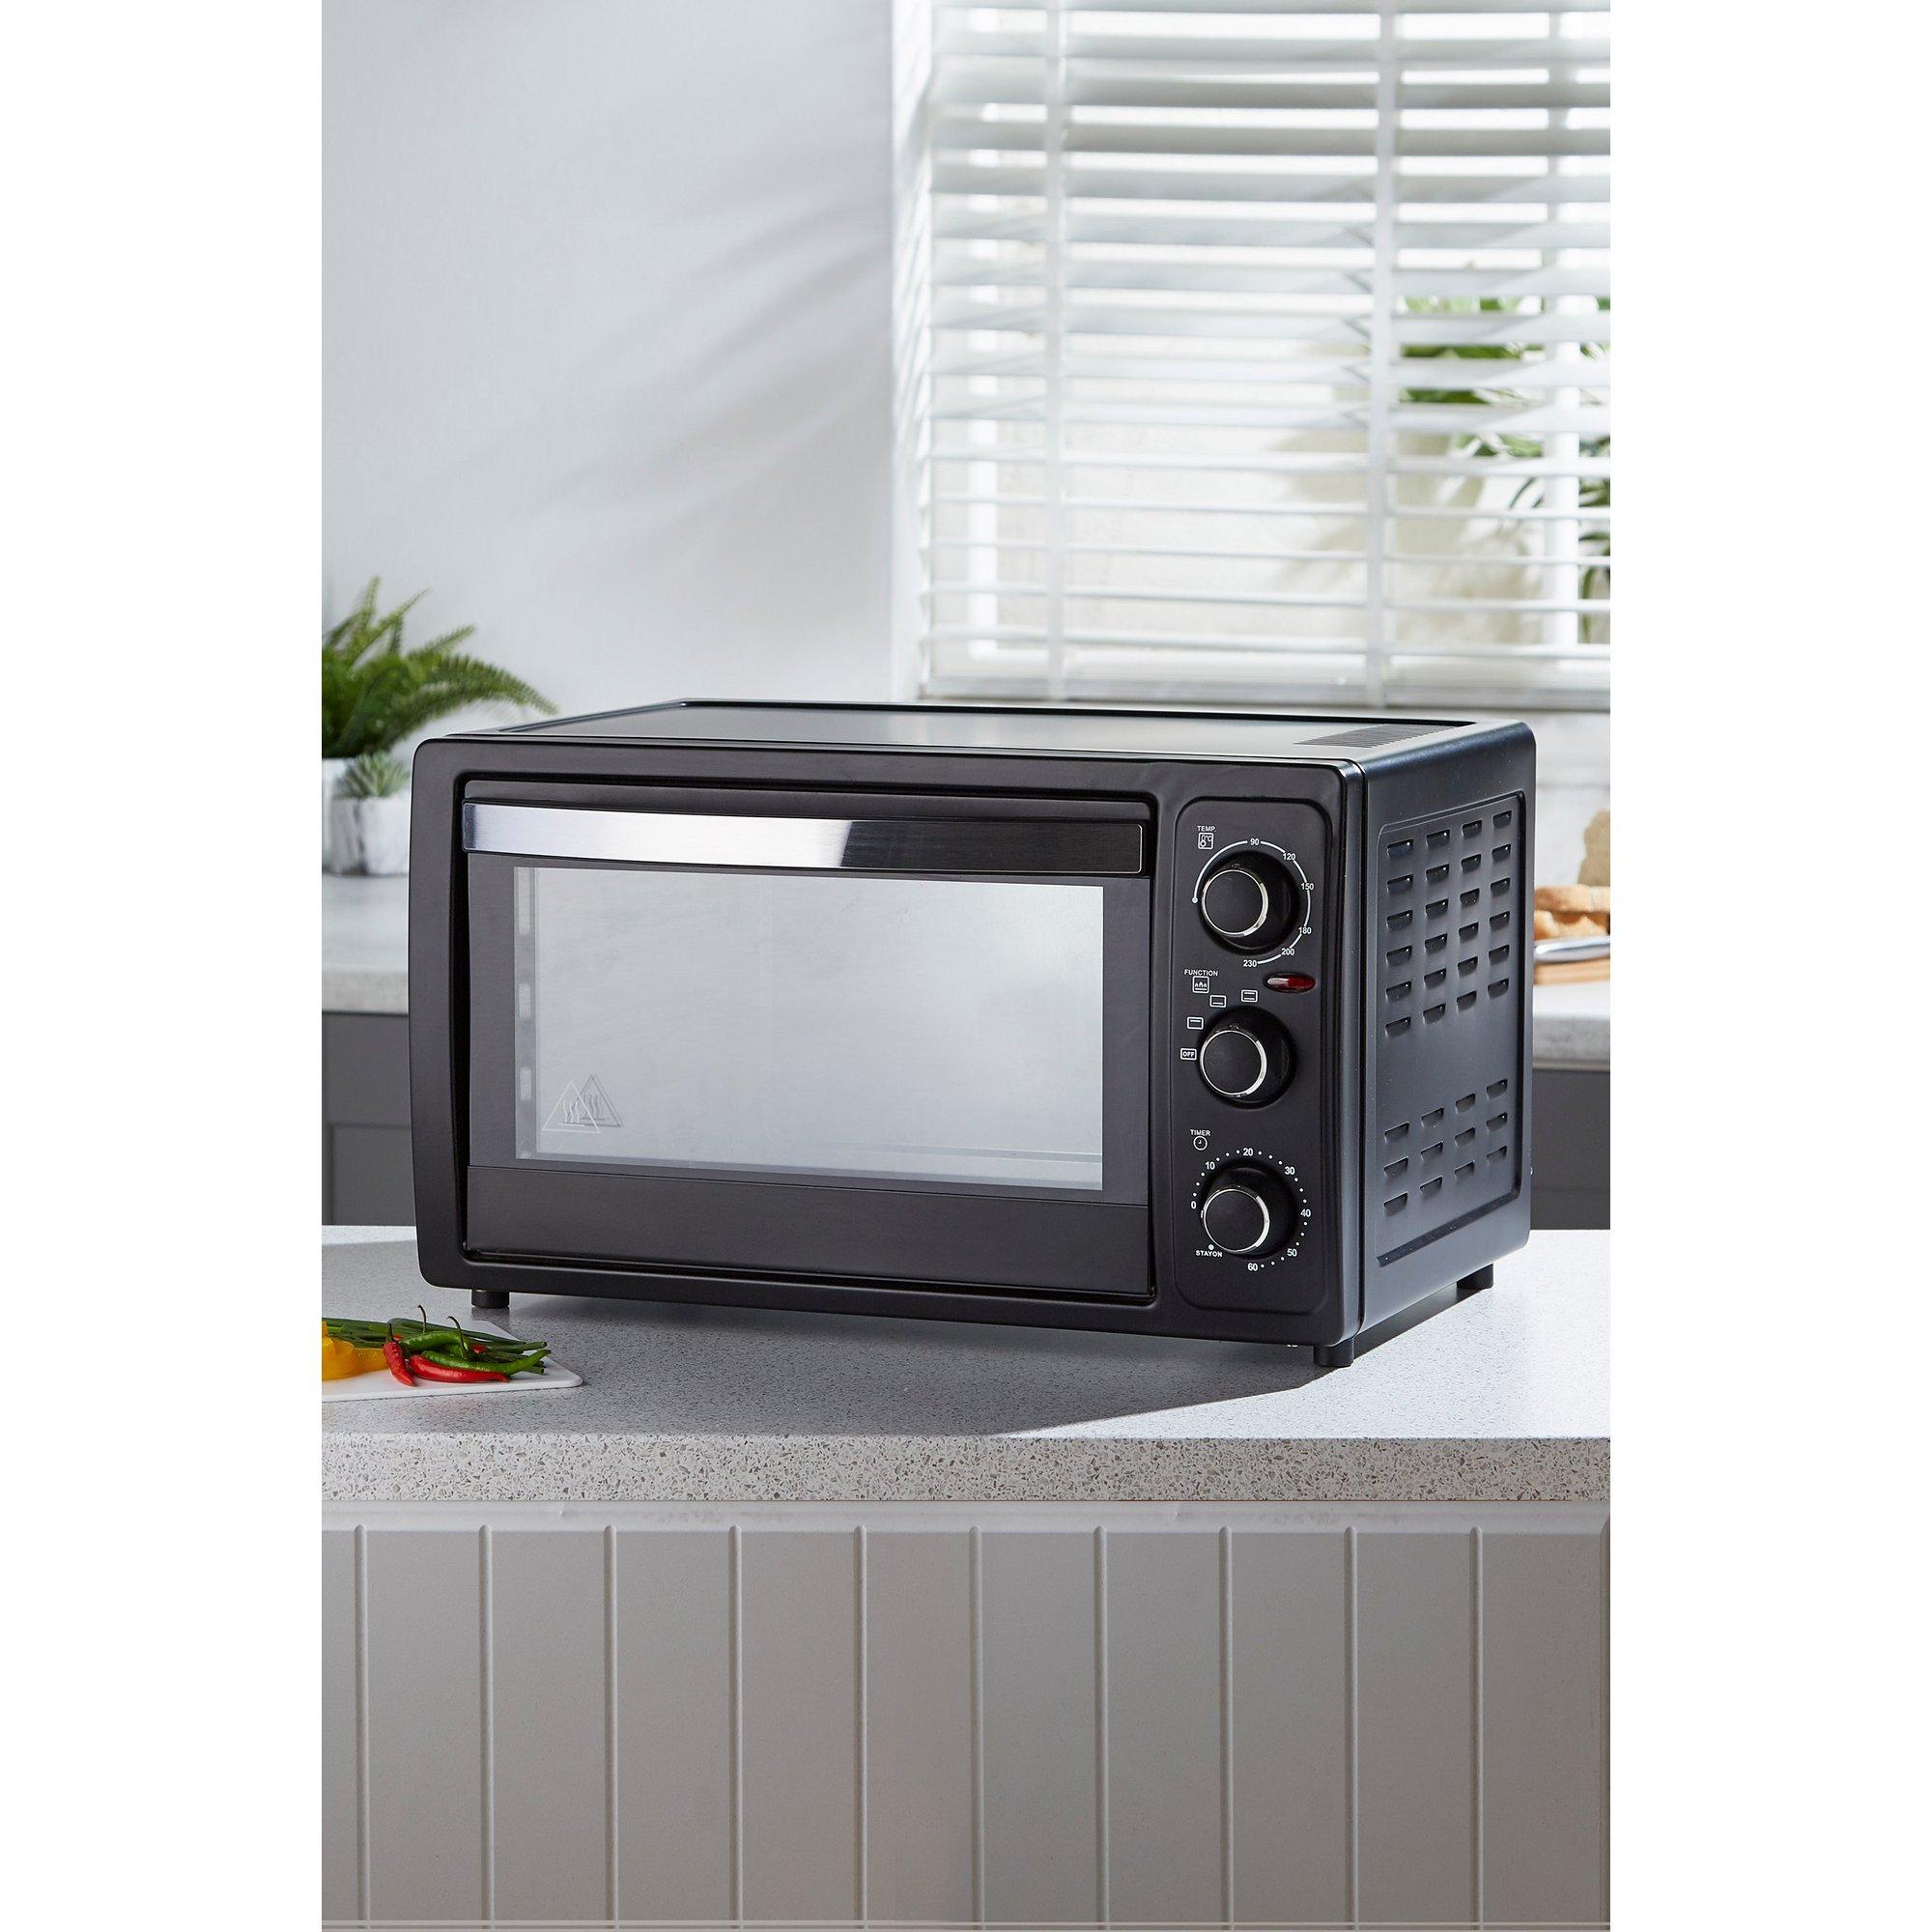 Image of 28 Litre Mini Oven